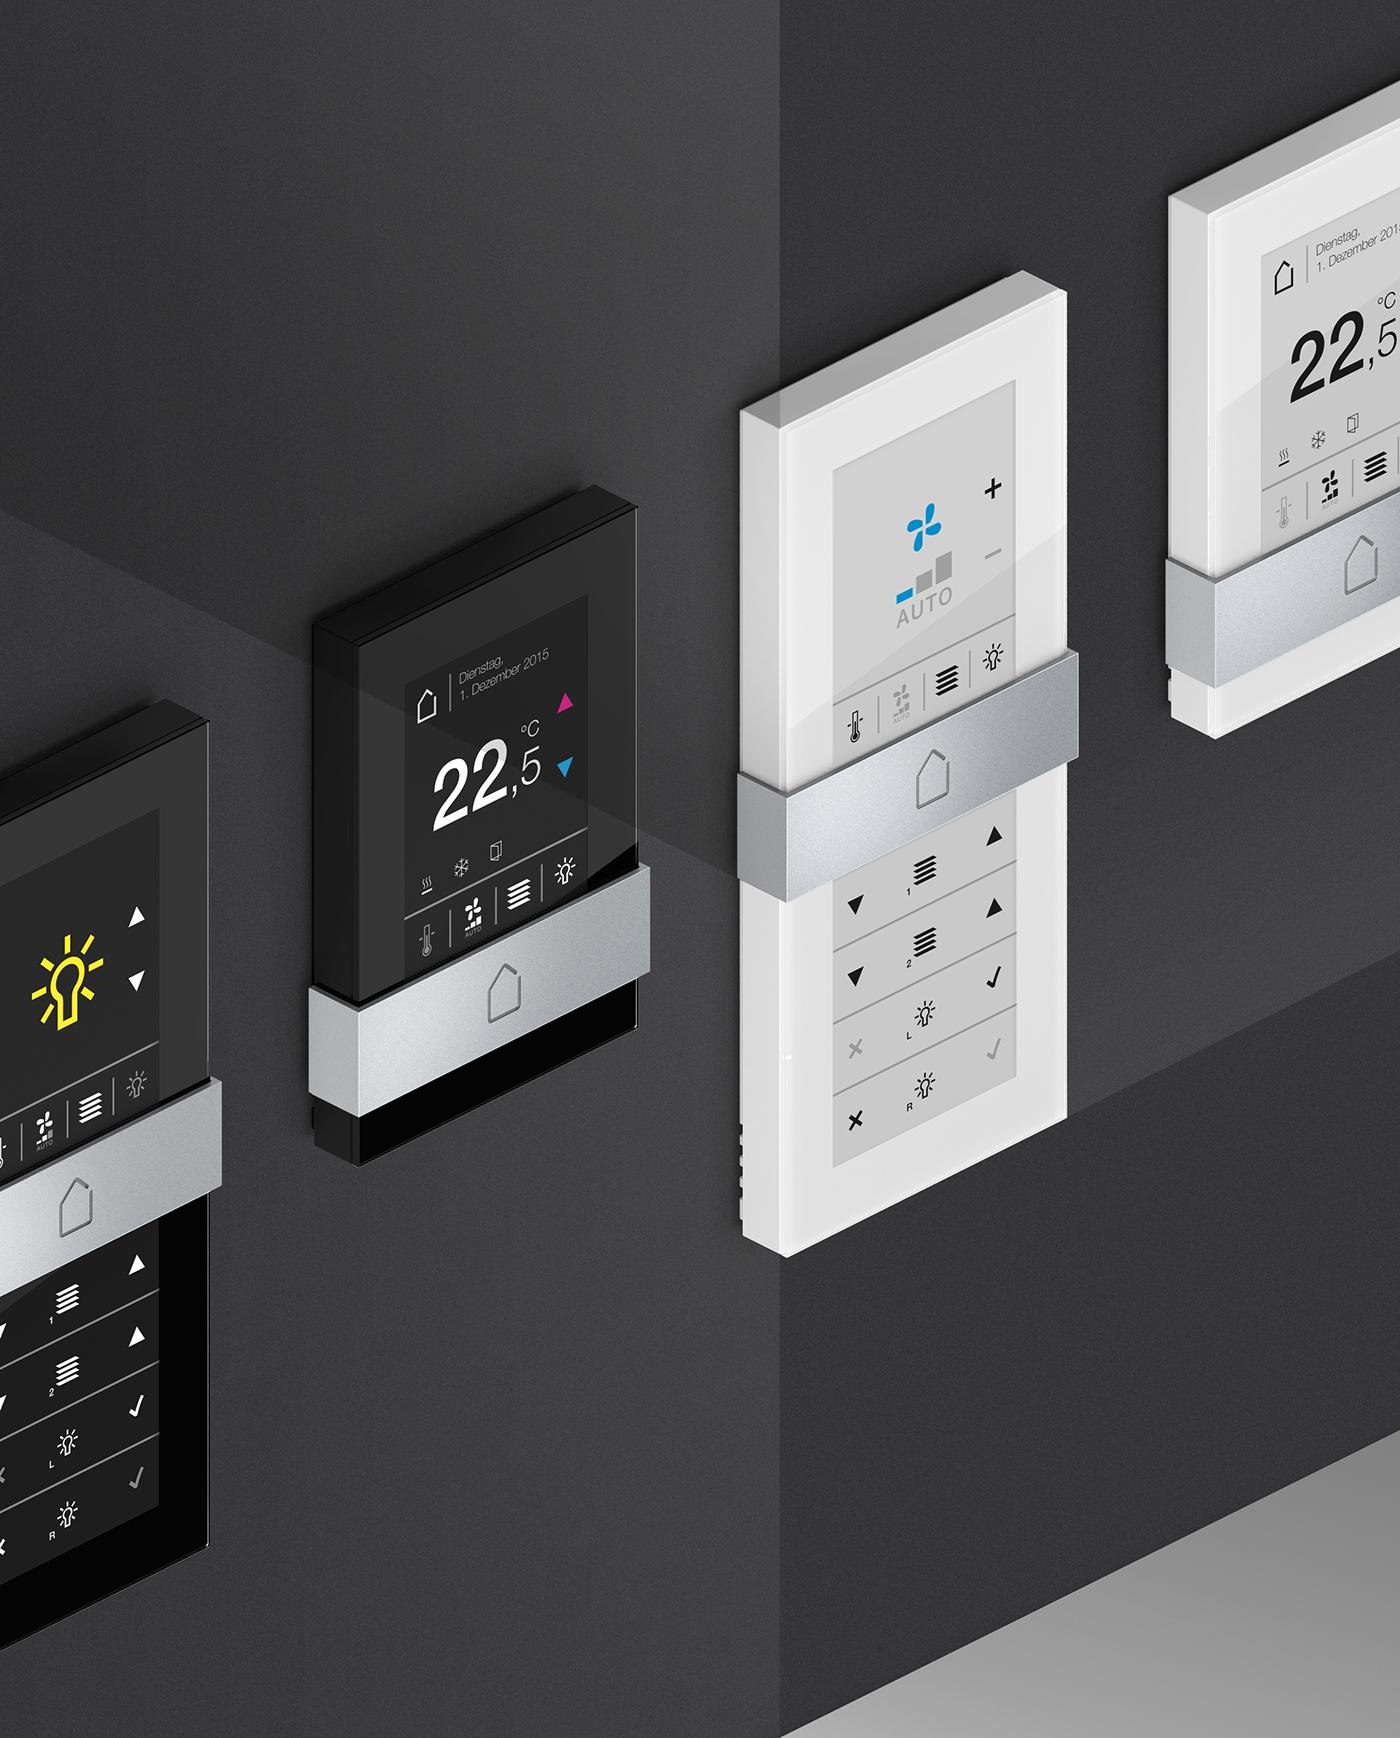 Room Operating Unit temperature Air condition heating remote glass aluminum room control setting